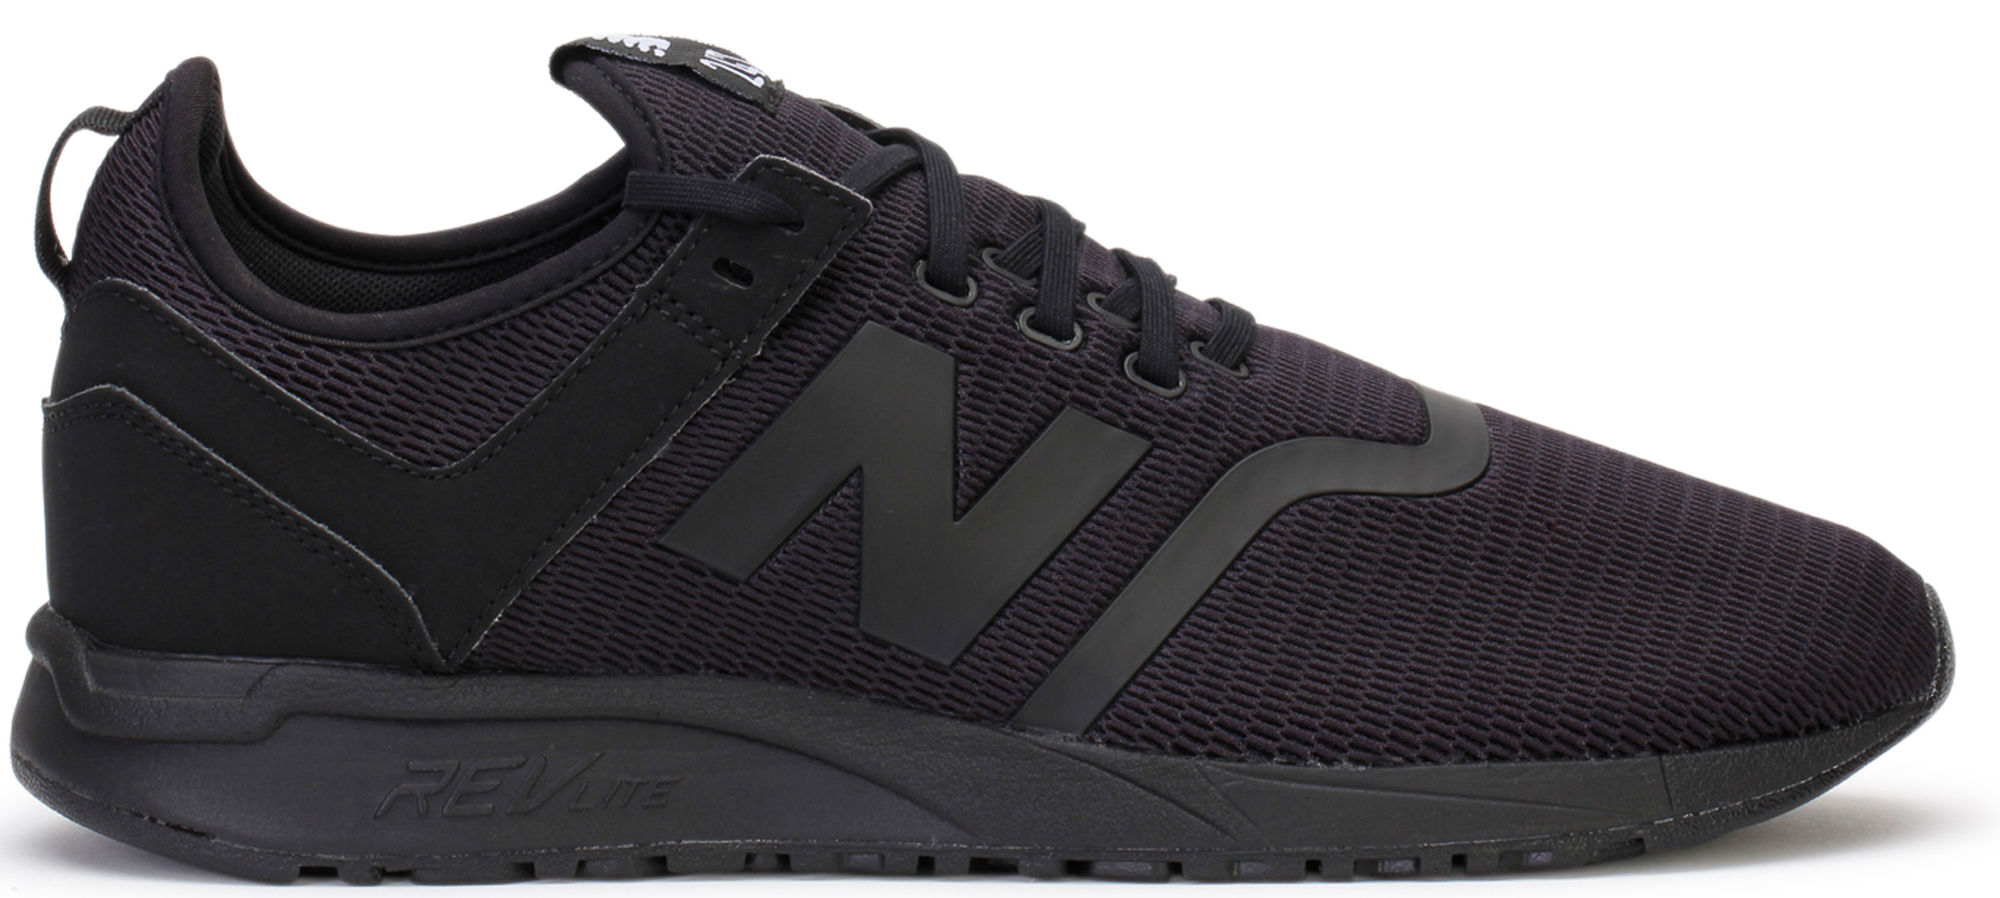 New Balance 247 Decon Black - Novelship